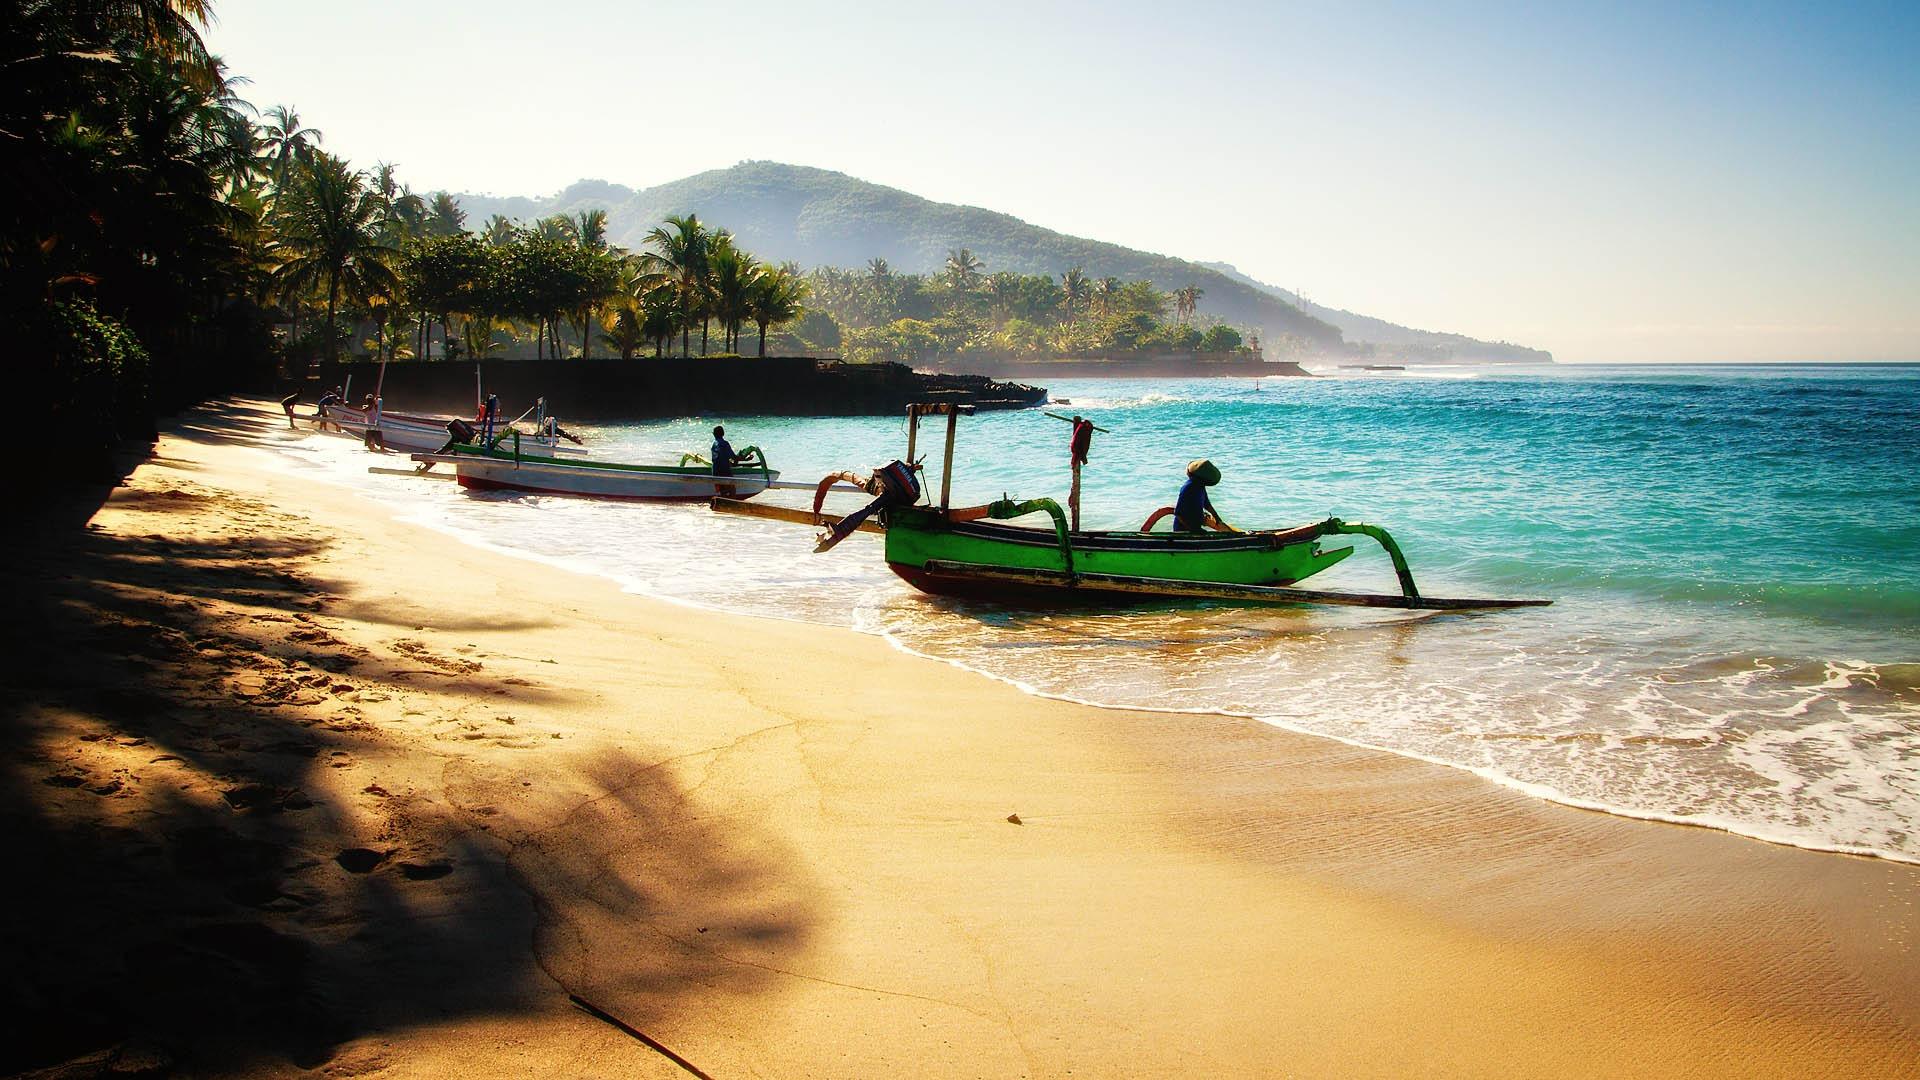 Take advantage of the beautiful Indian Ocean waters in Bali.